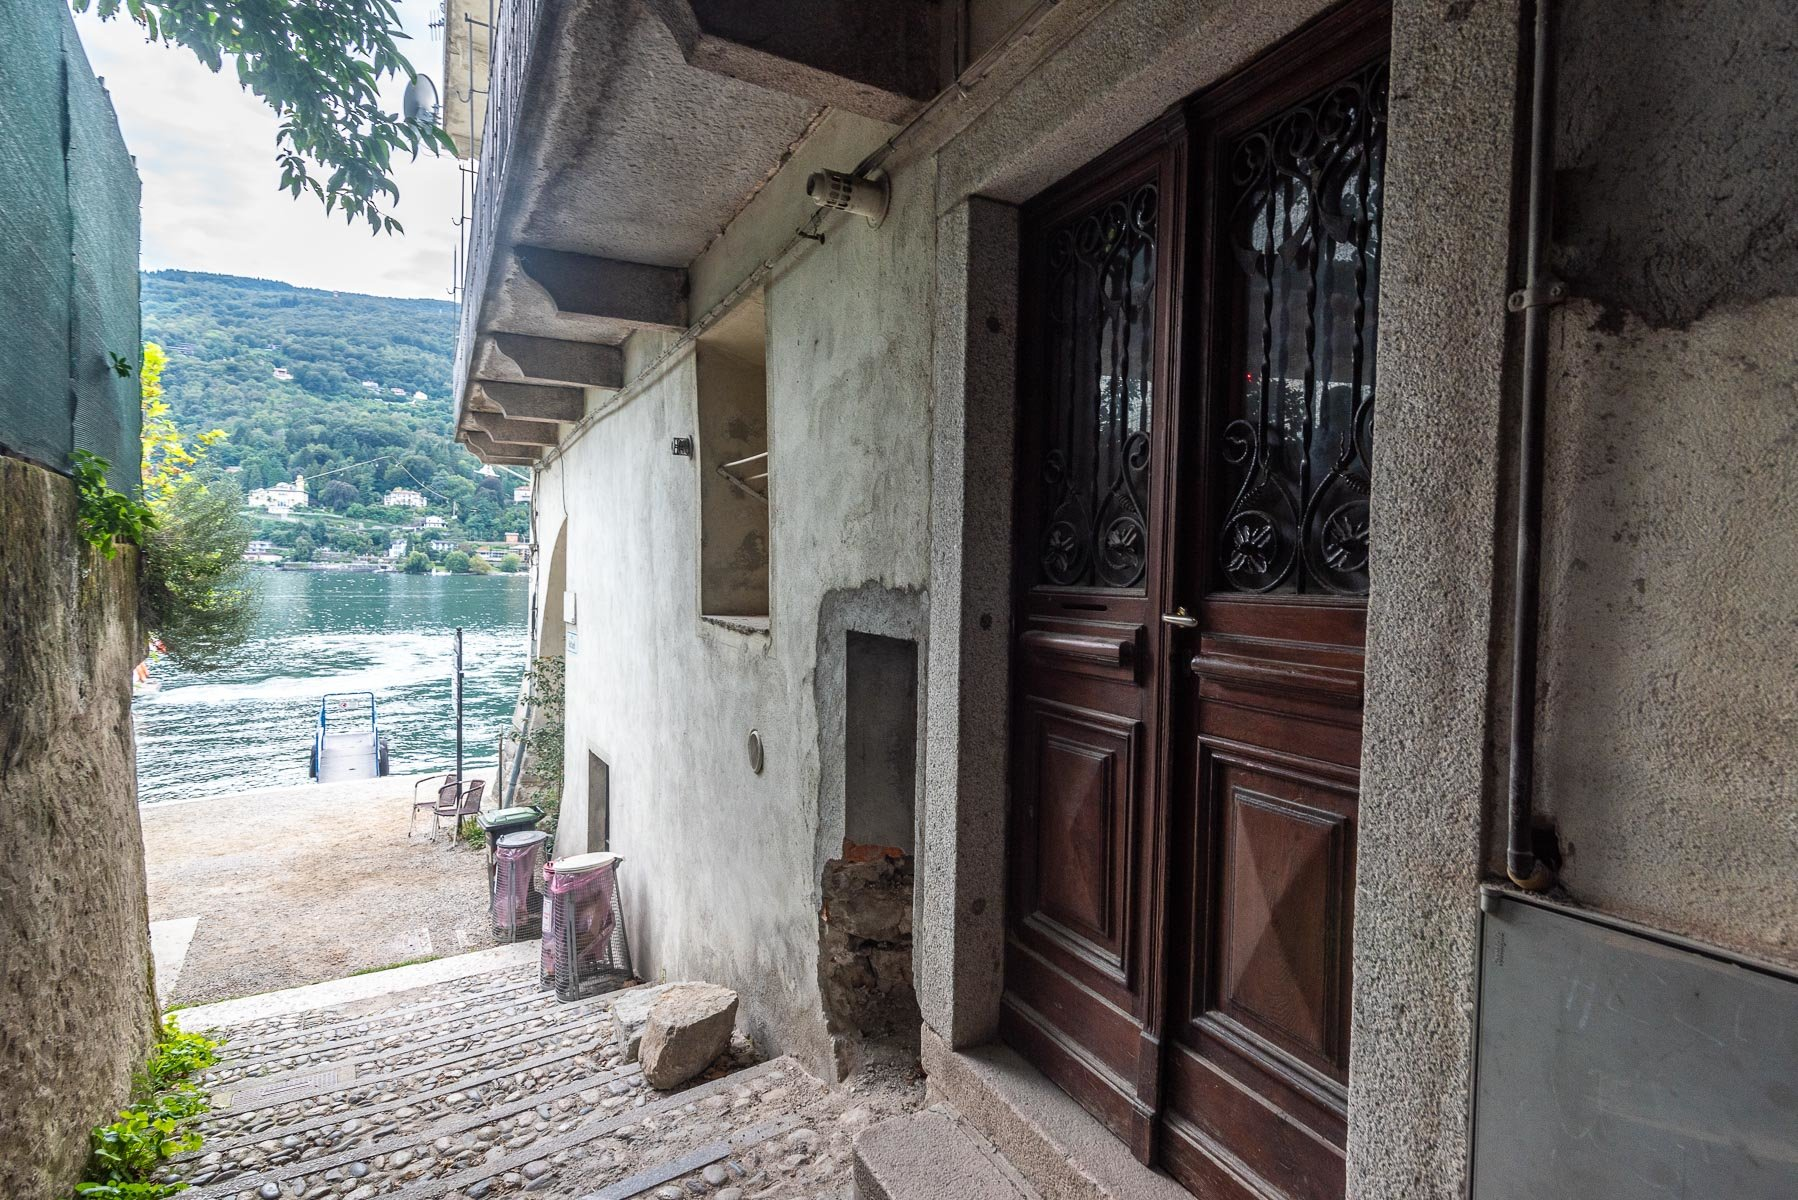 Apartment for sale in Pescatori Island,Stresa - street view